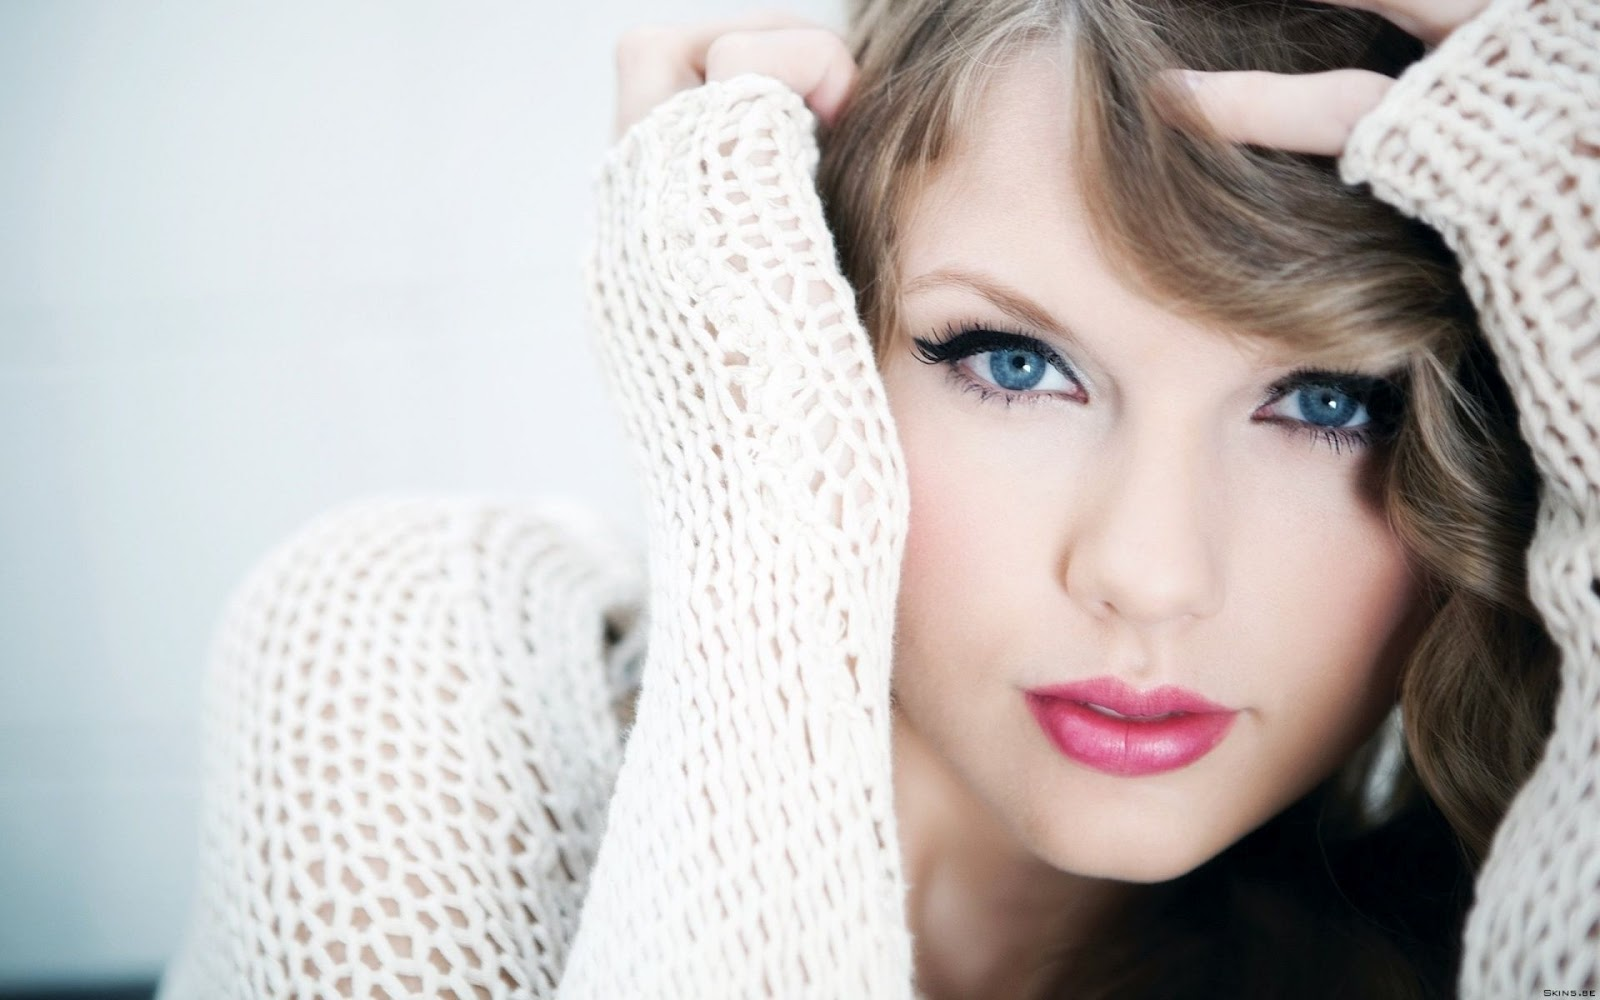 47 Most Beautiful Women Hd Wallpaper On Wallpapersafari